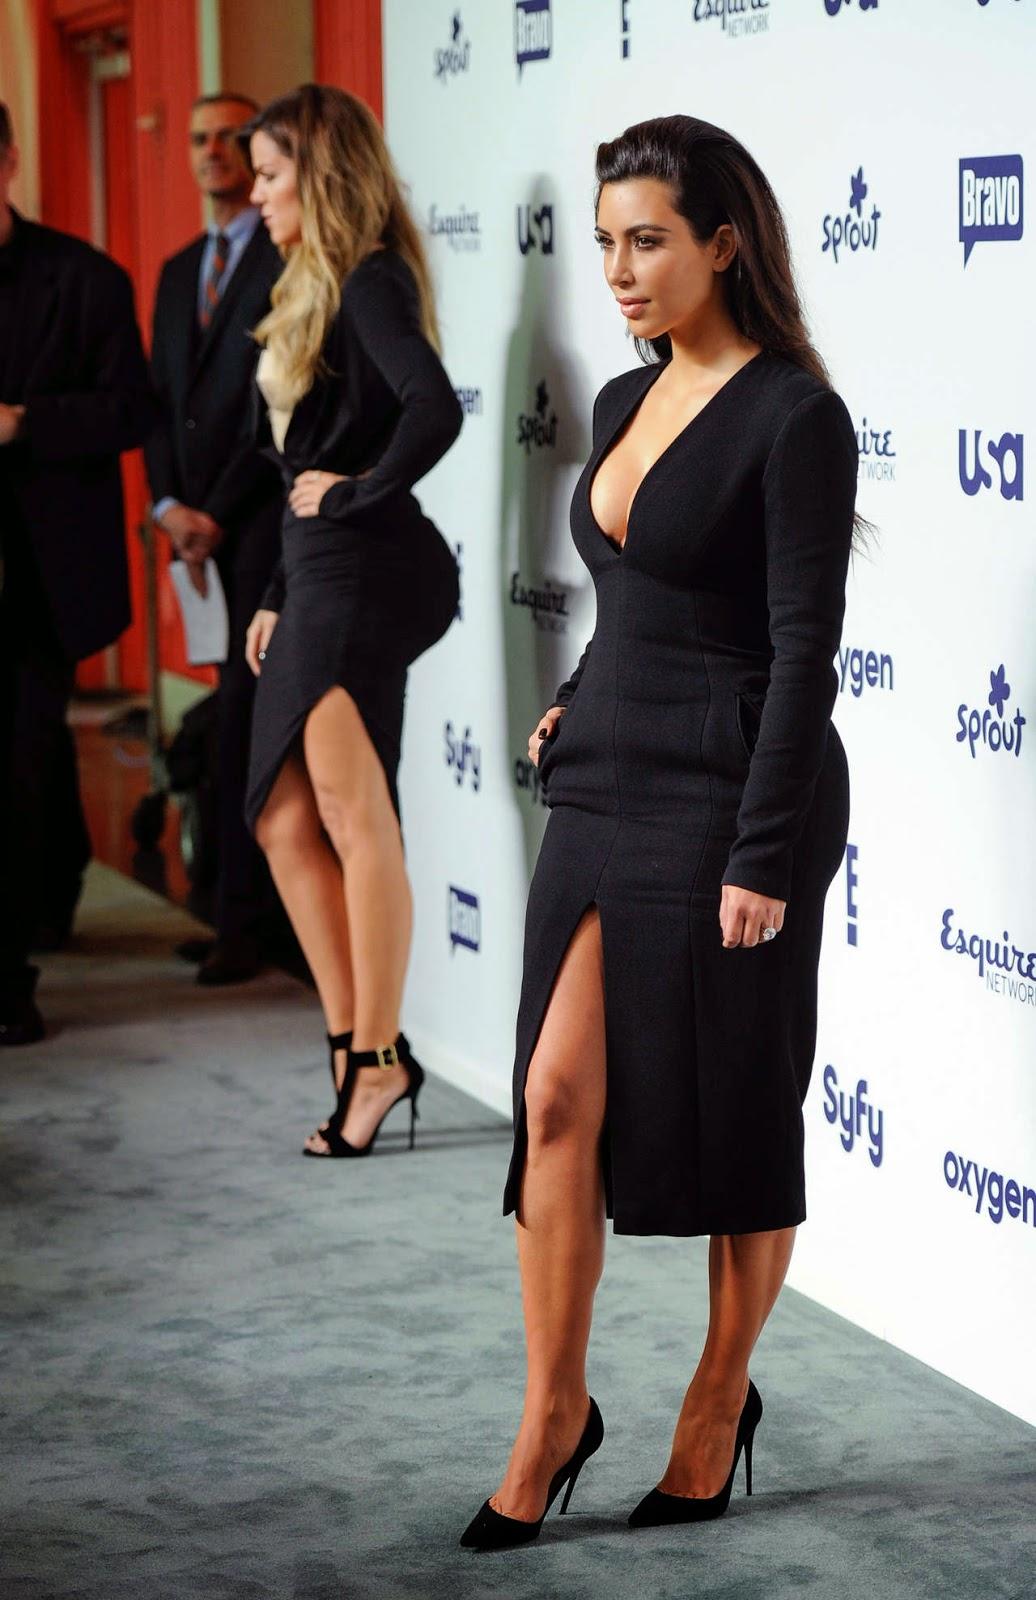 kardashian sisters news